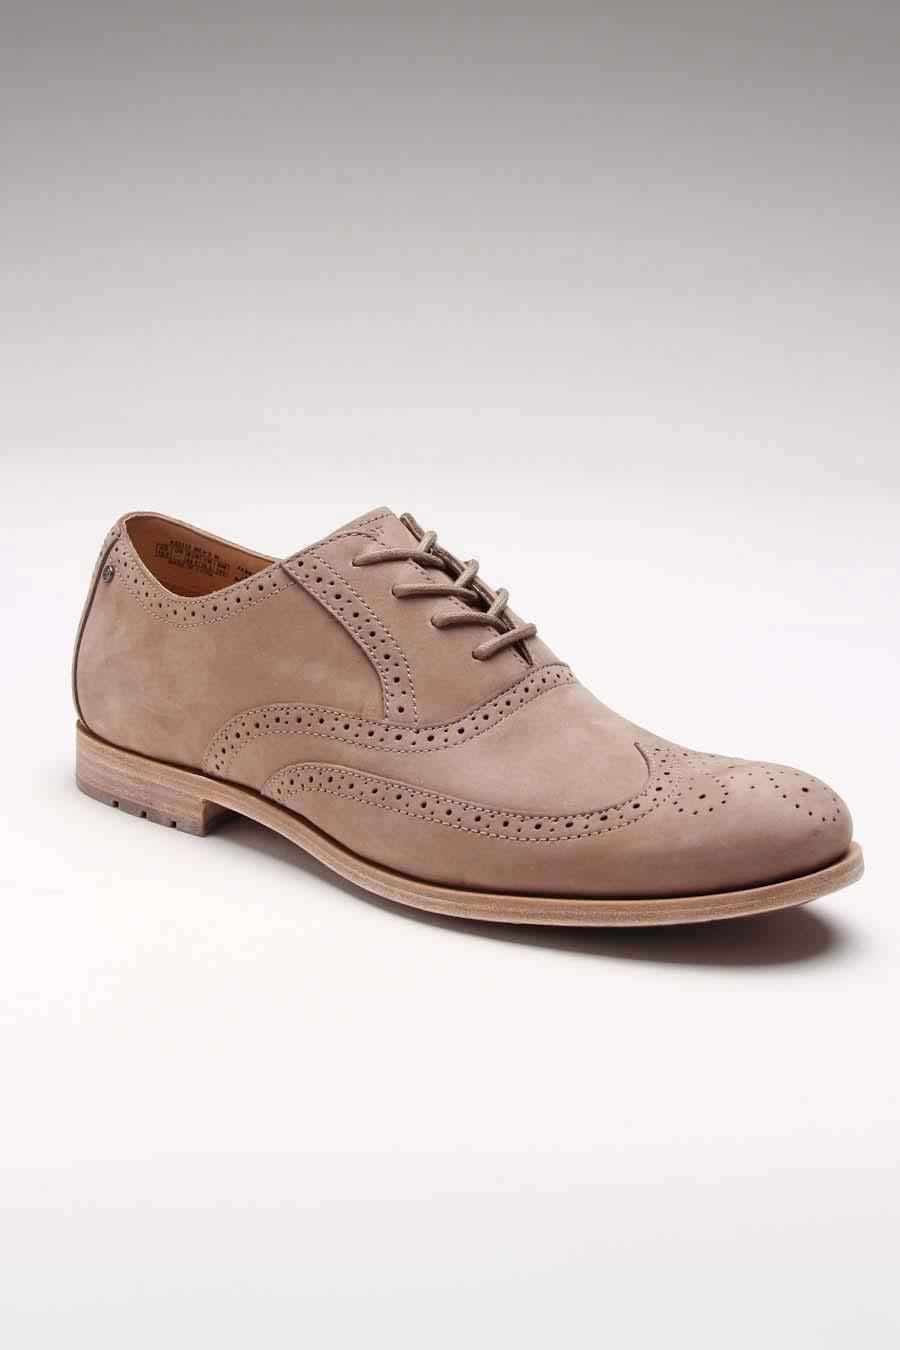 94b329ddab6 Day To Night Wing Tip Shoe Love this mens shoe.